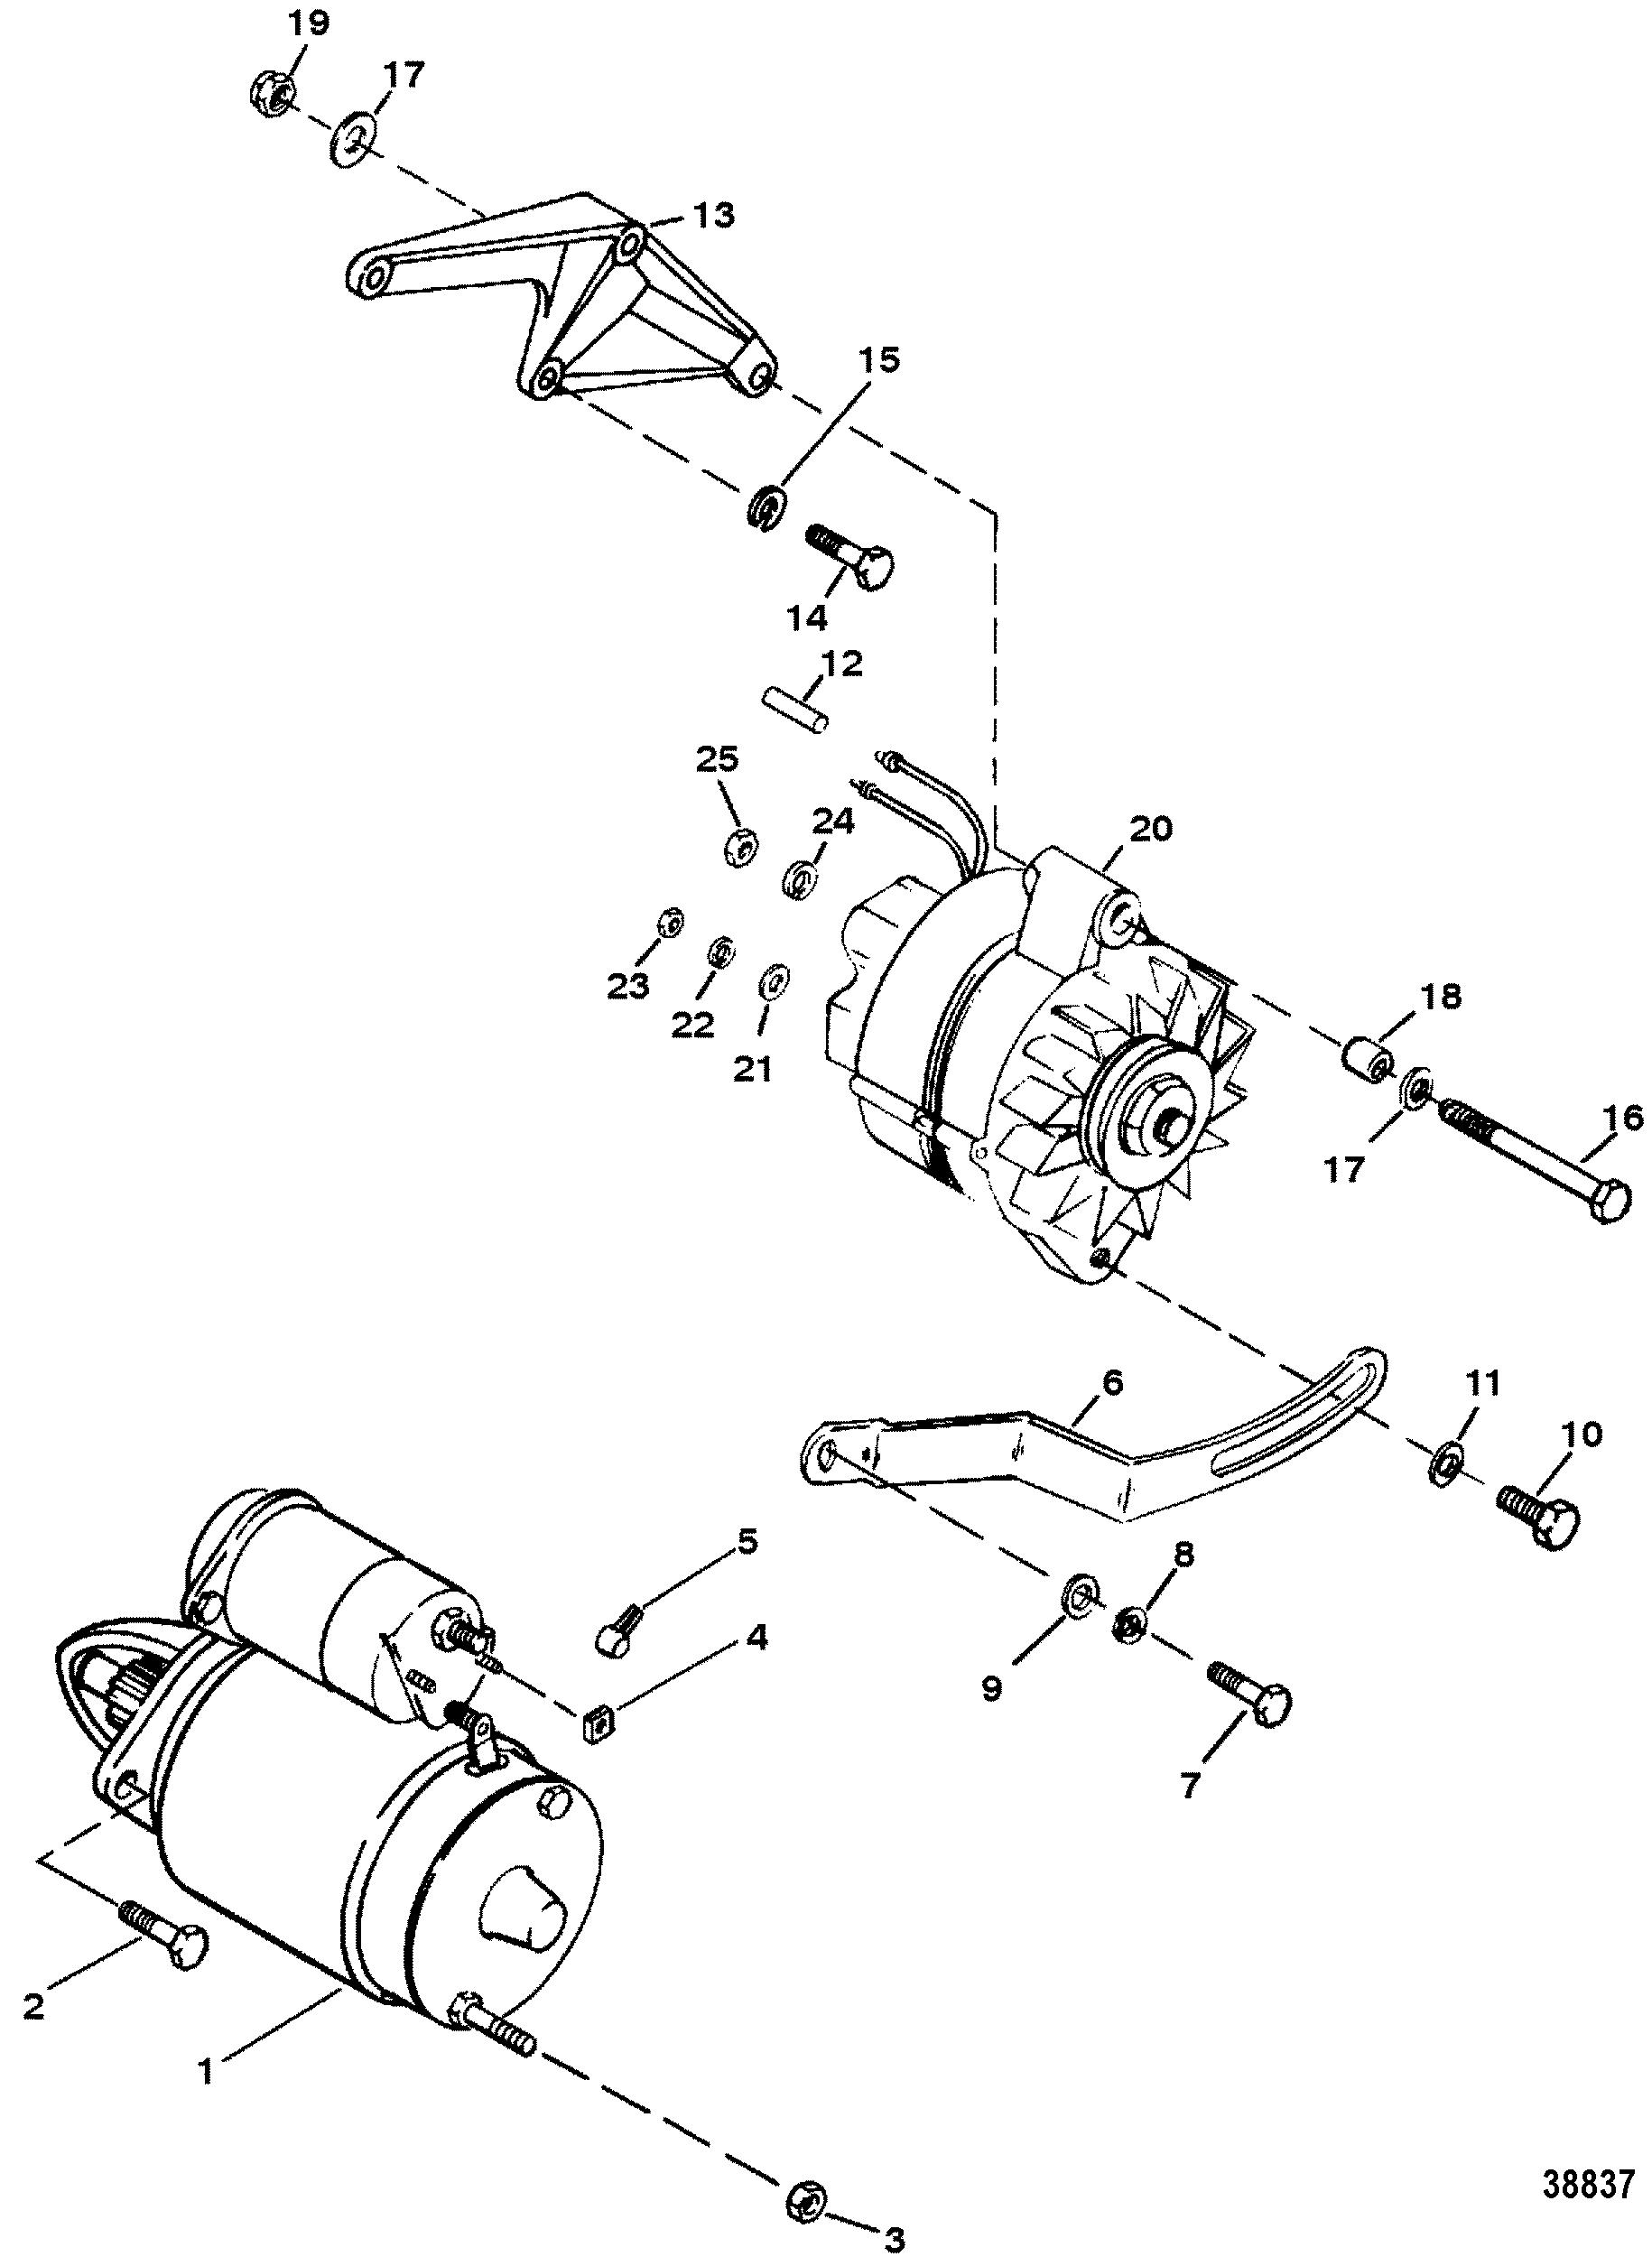 7 4l bravo (gen 5) gm 454 v-8 1992-1996 - serial 0d0603118 thru 0f800699 -  starter and alternator